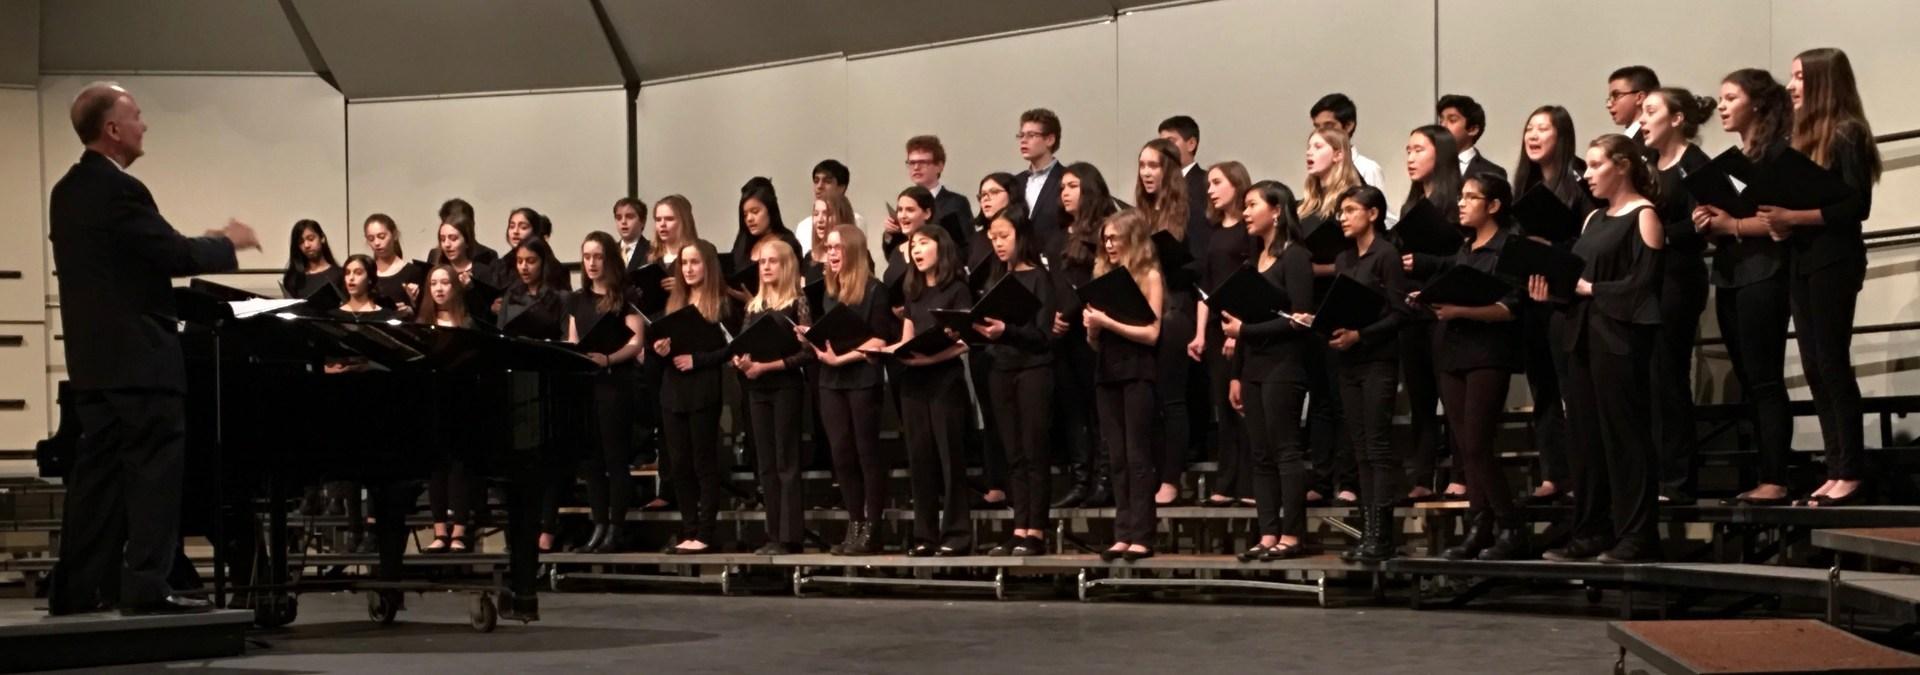 MS Select Chorus